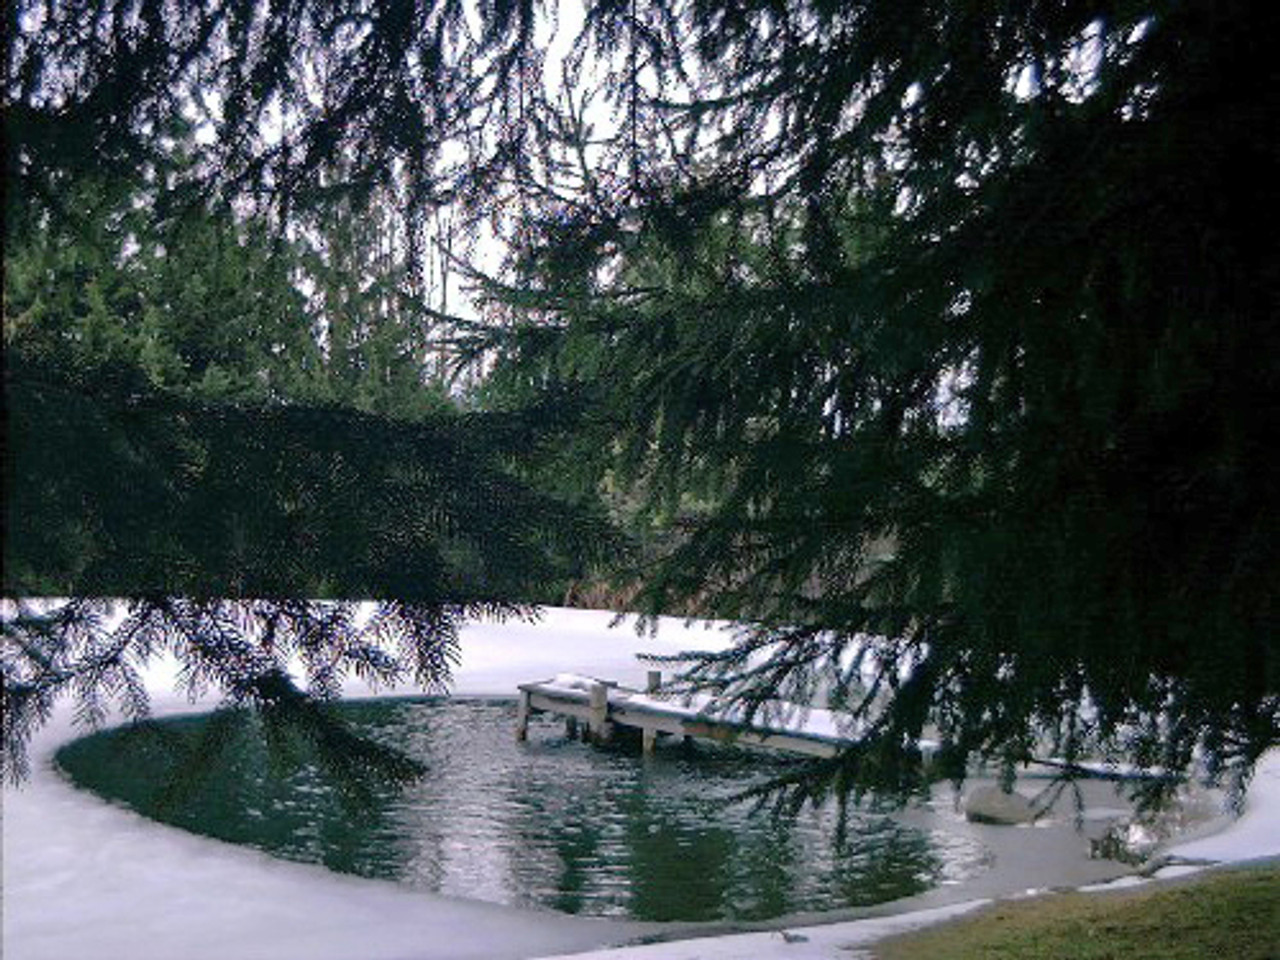 Kasco Deicer Models for Marinas, Docks, Piers, Lakes & Ponds